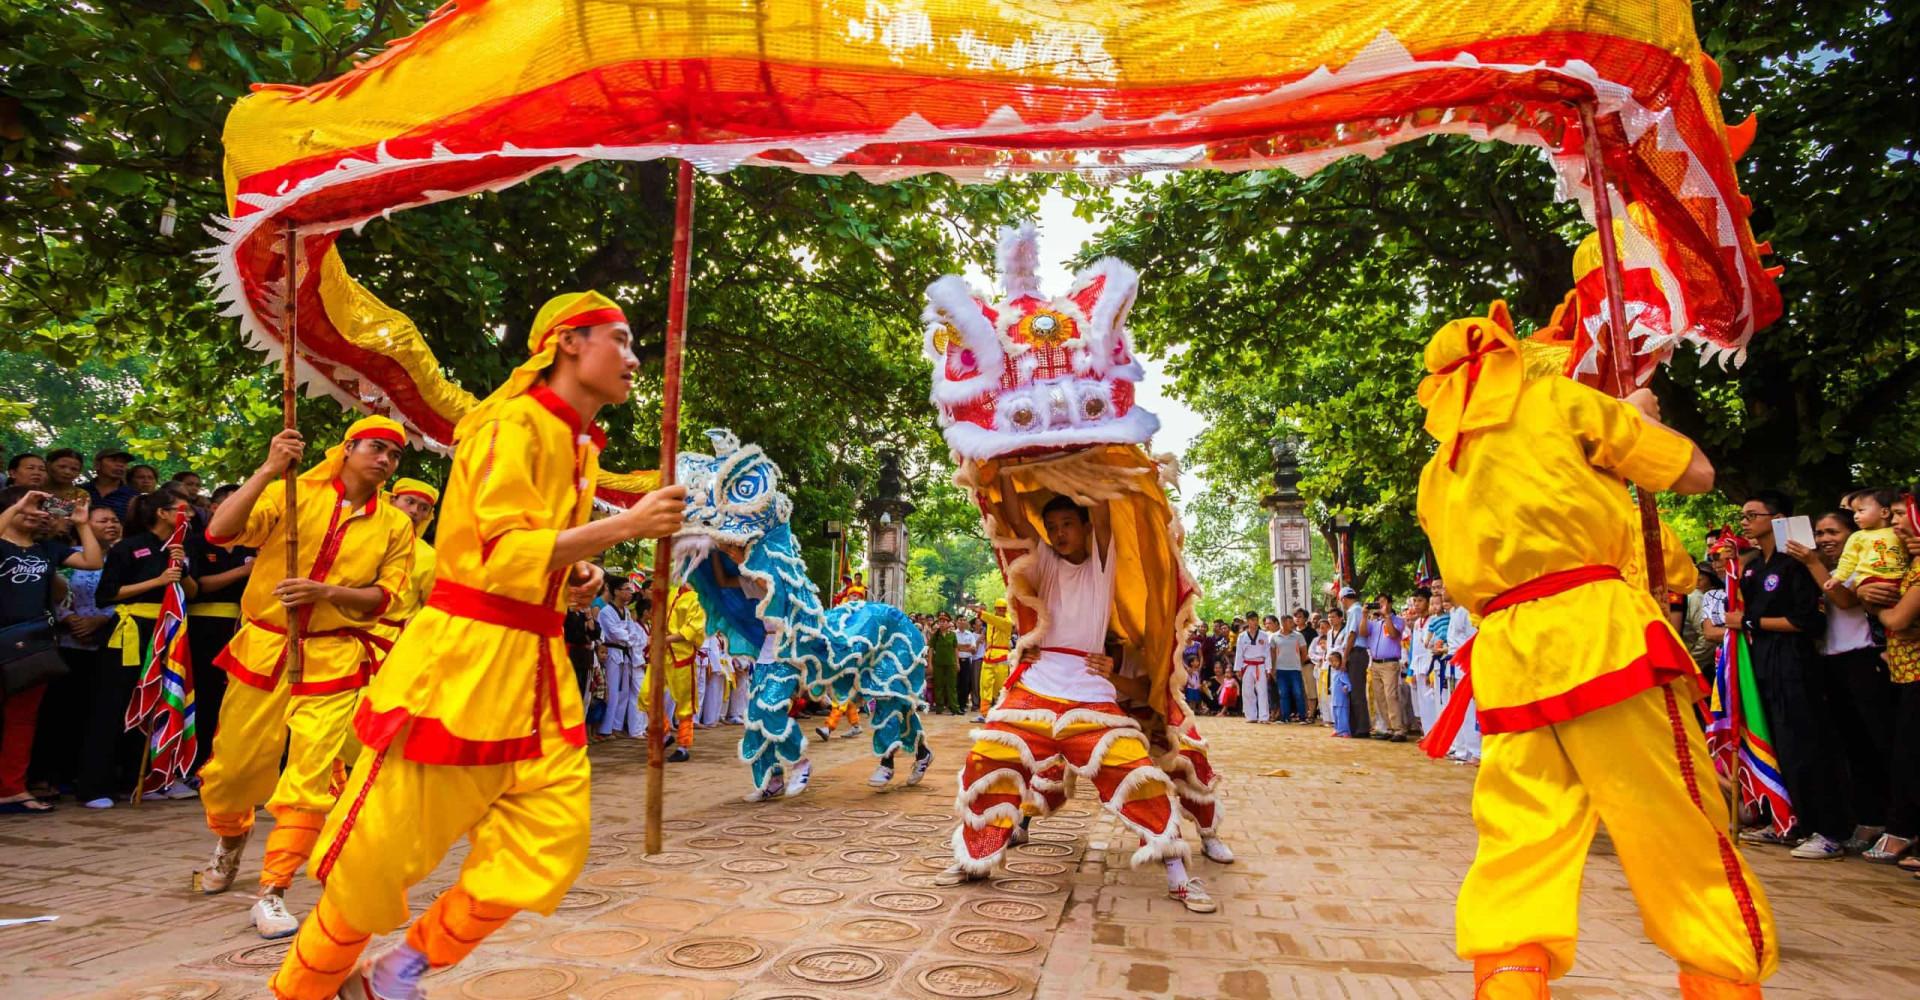 Vietnam: the jewel of Southeast Asia